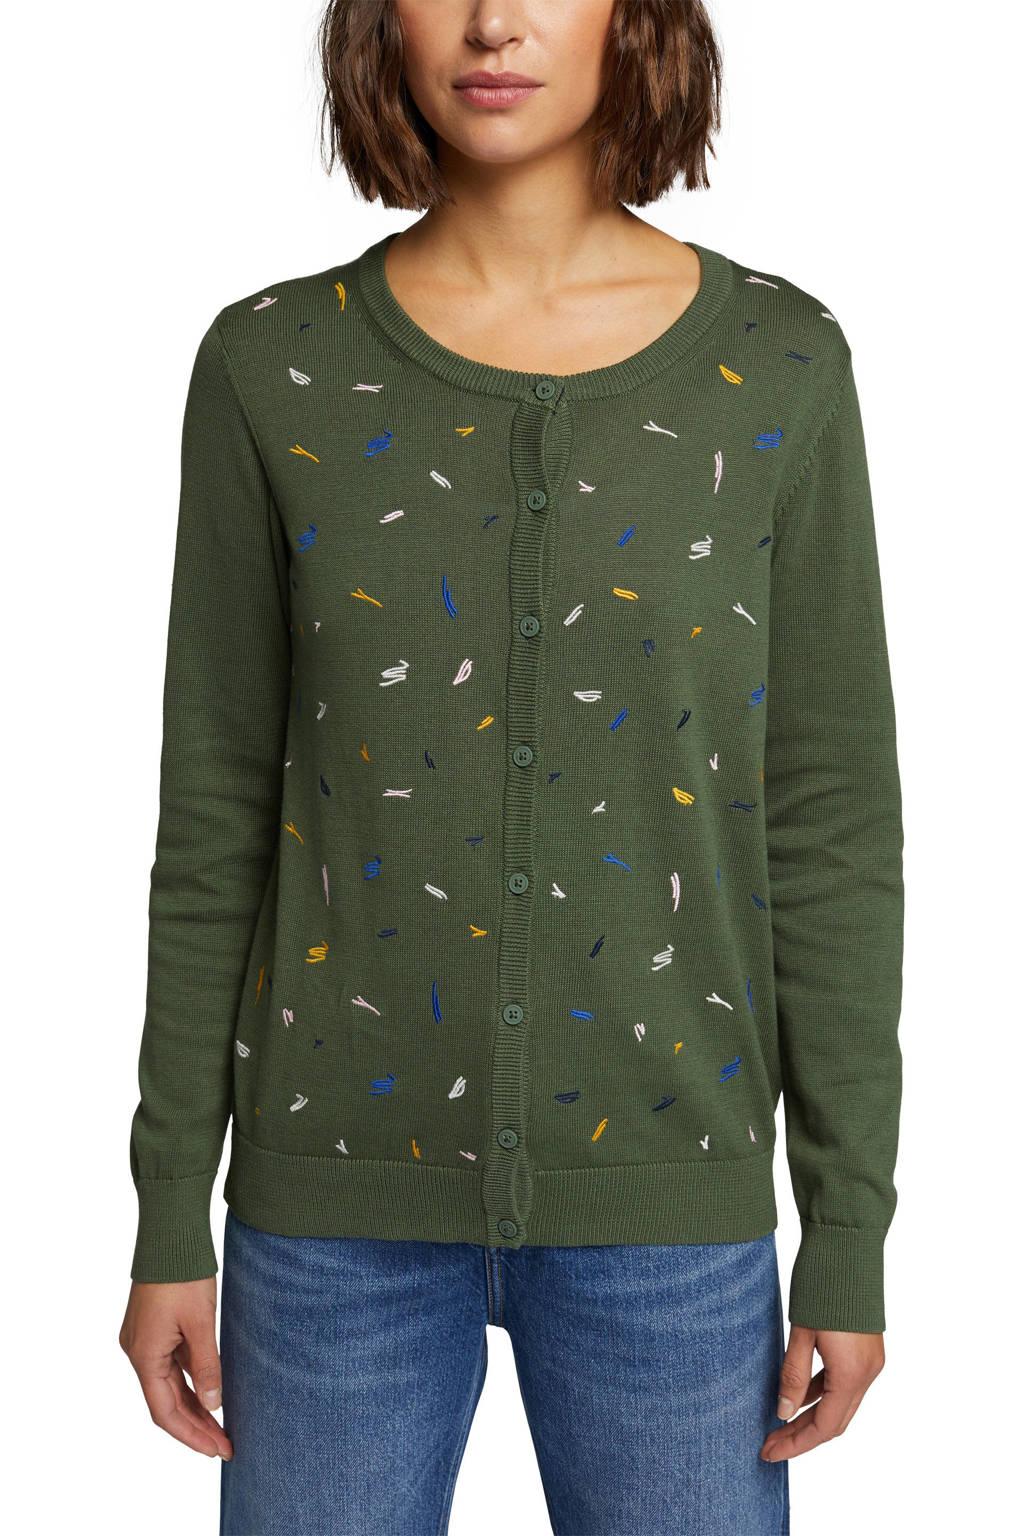 edc Women vest met printopdruk en borduursels donkergroen/wit/blauw, Donkergroen/wit/blauw